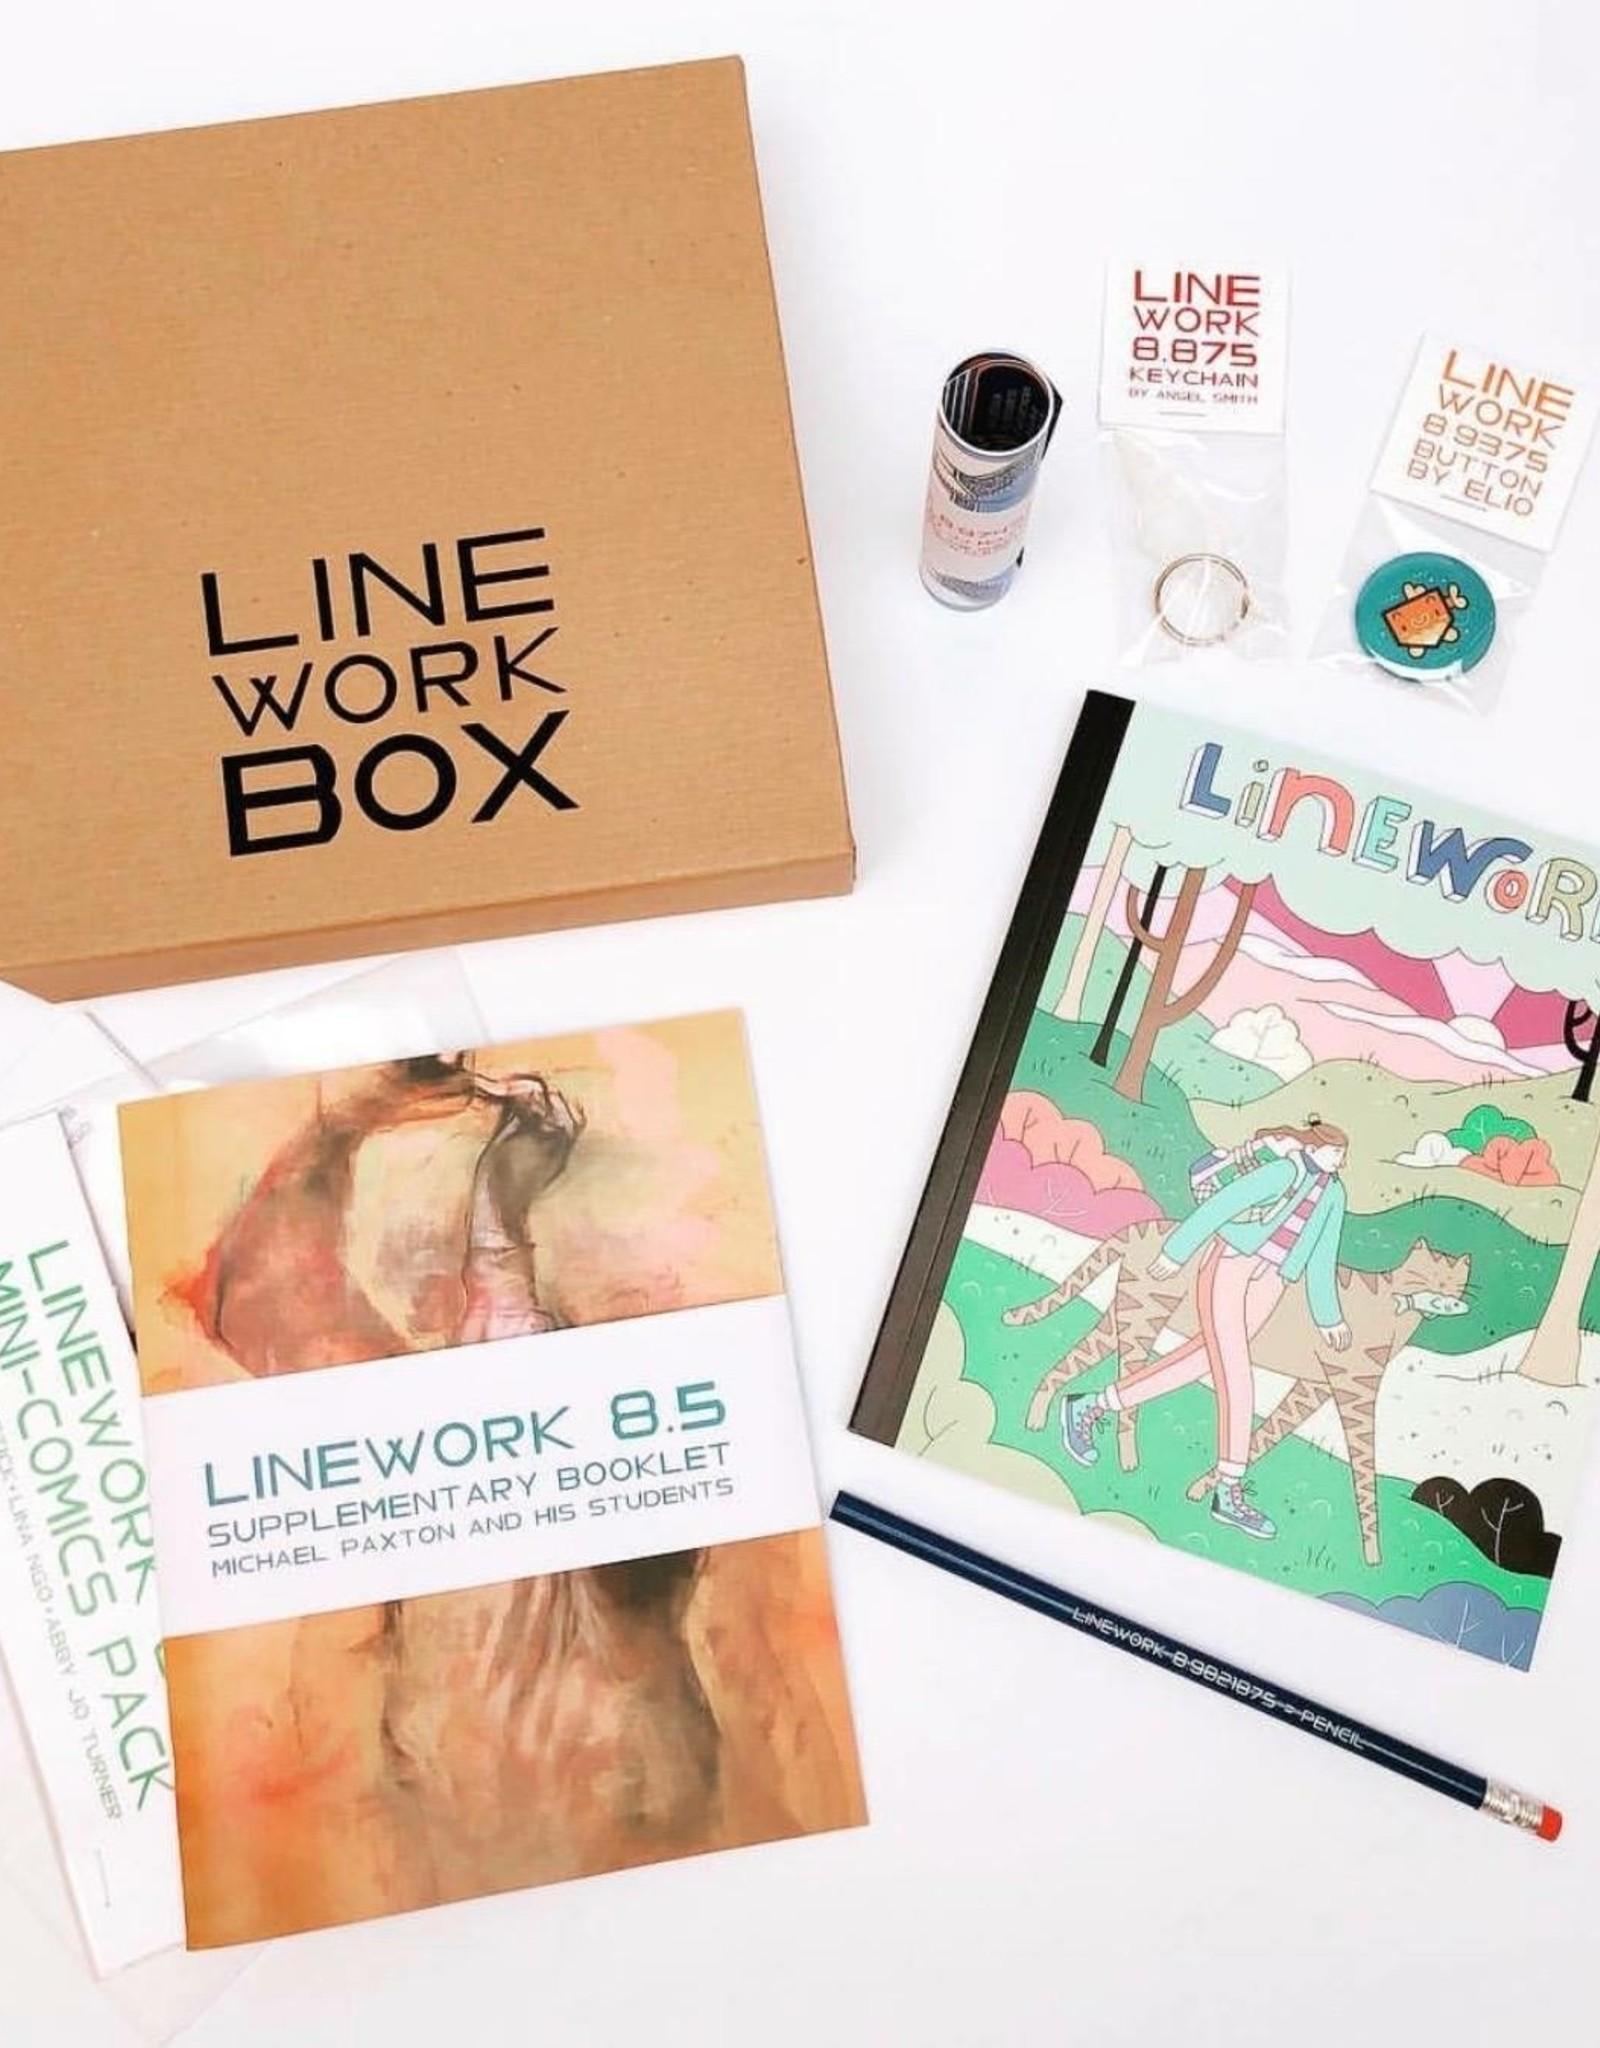 LINEWORK BOX Volume 8